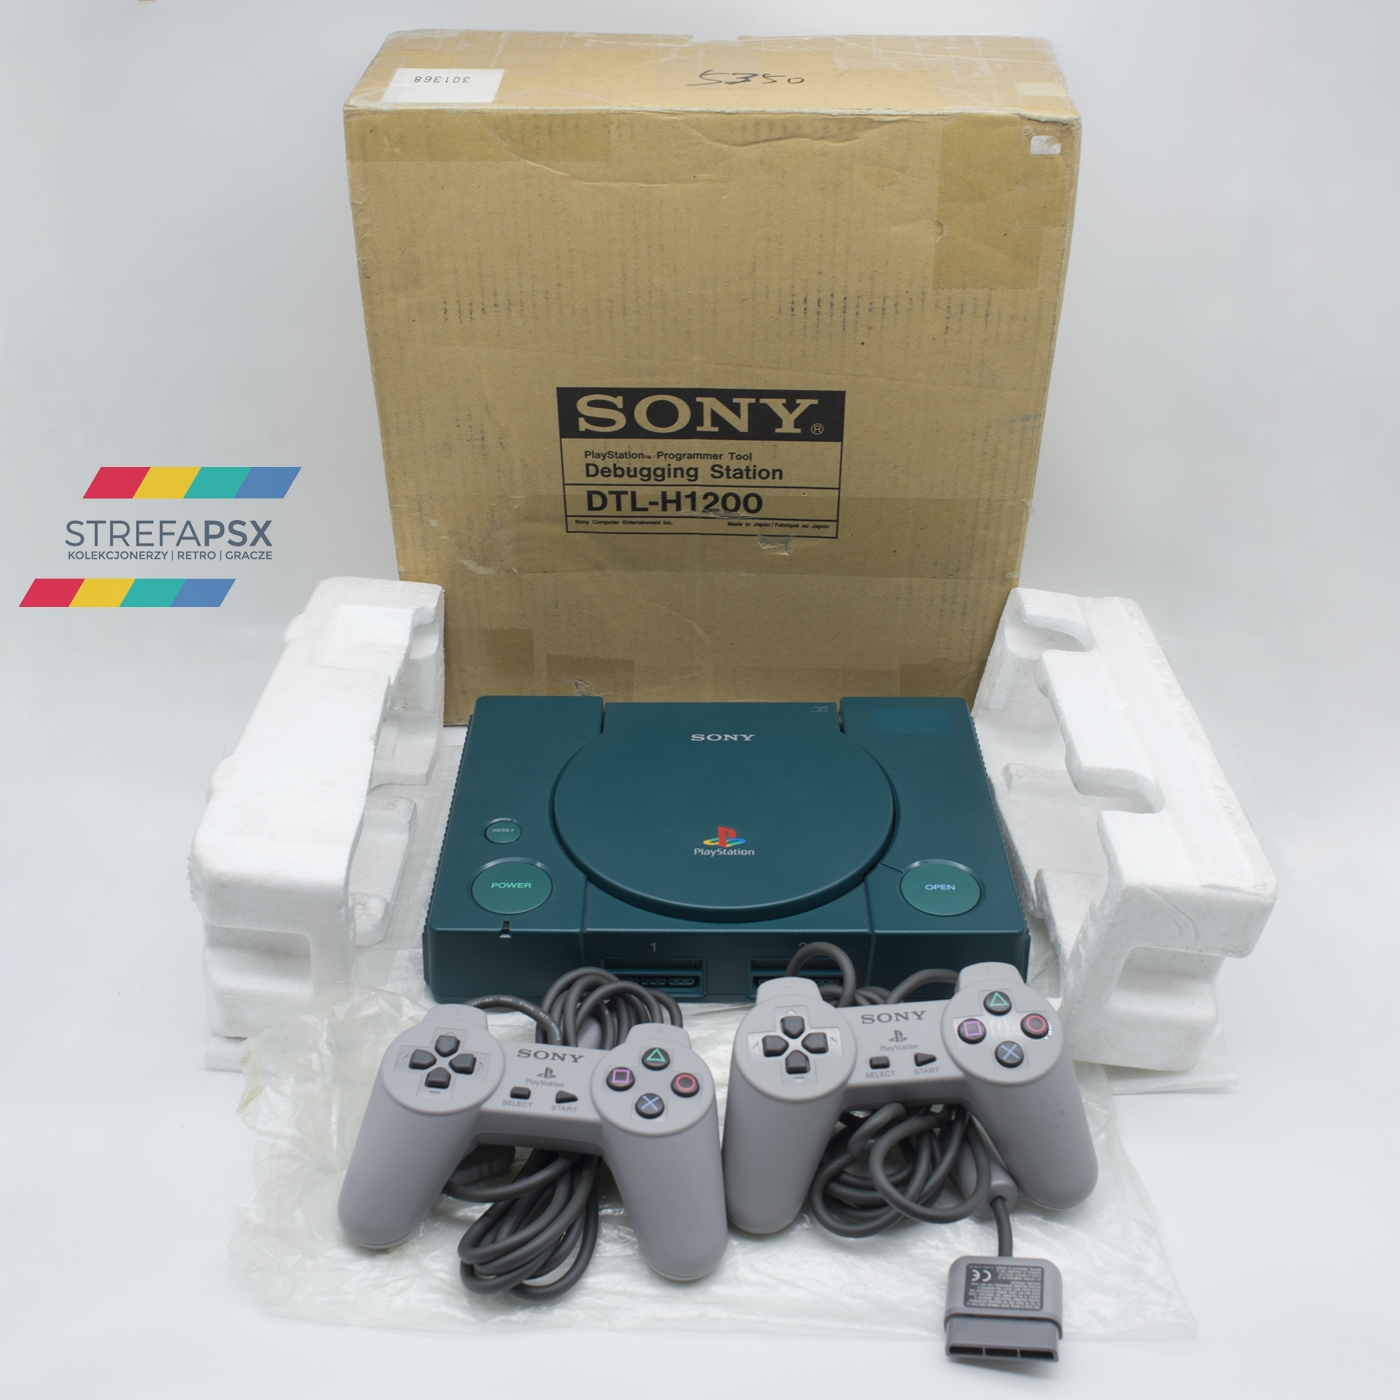 dtl h1200 playstation 07 - Odkrywamy historię zestawów deweloperskich PlayStation